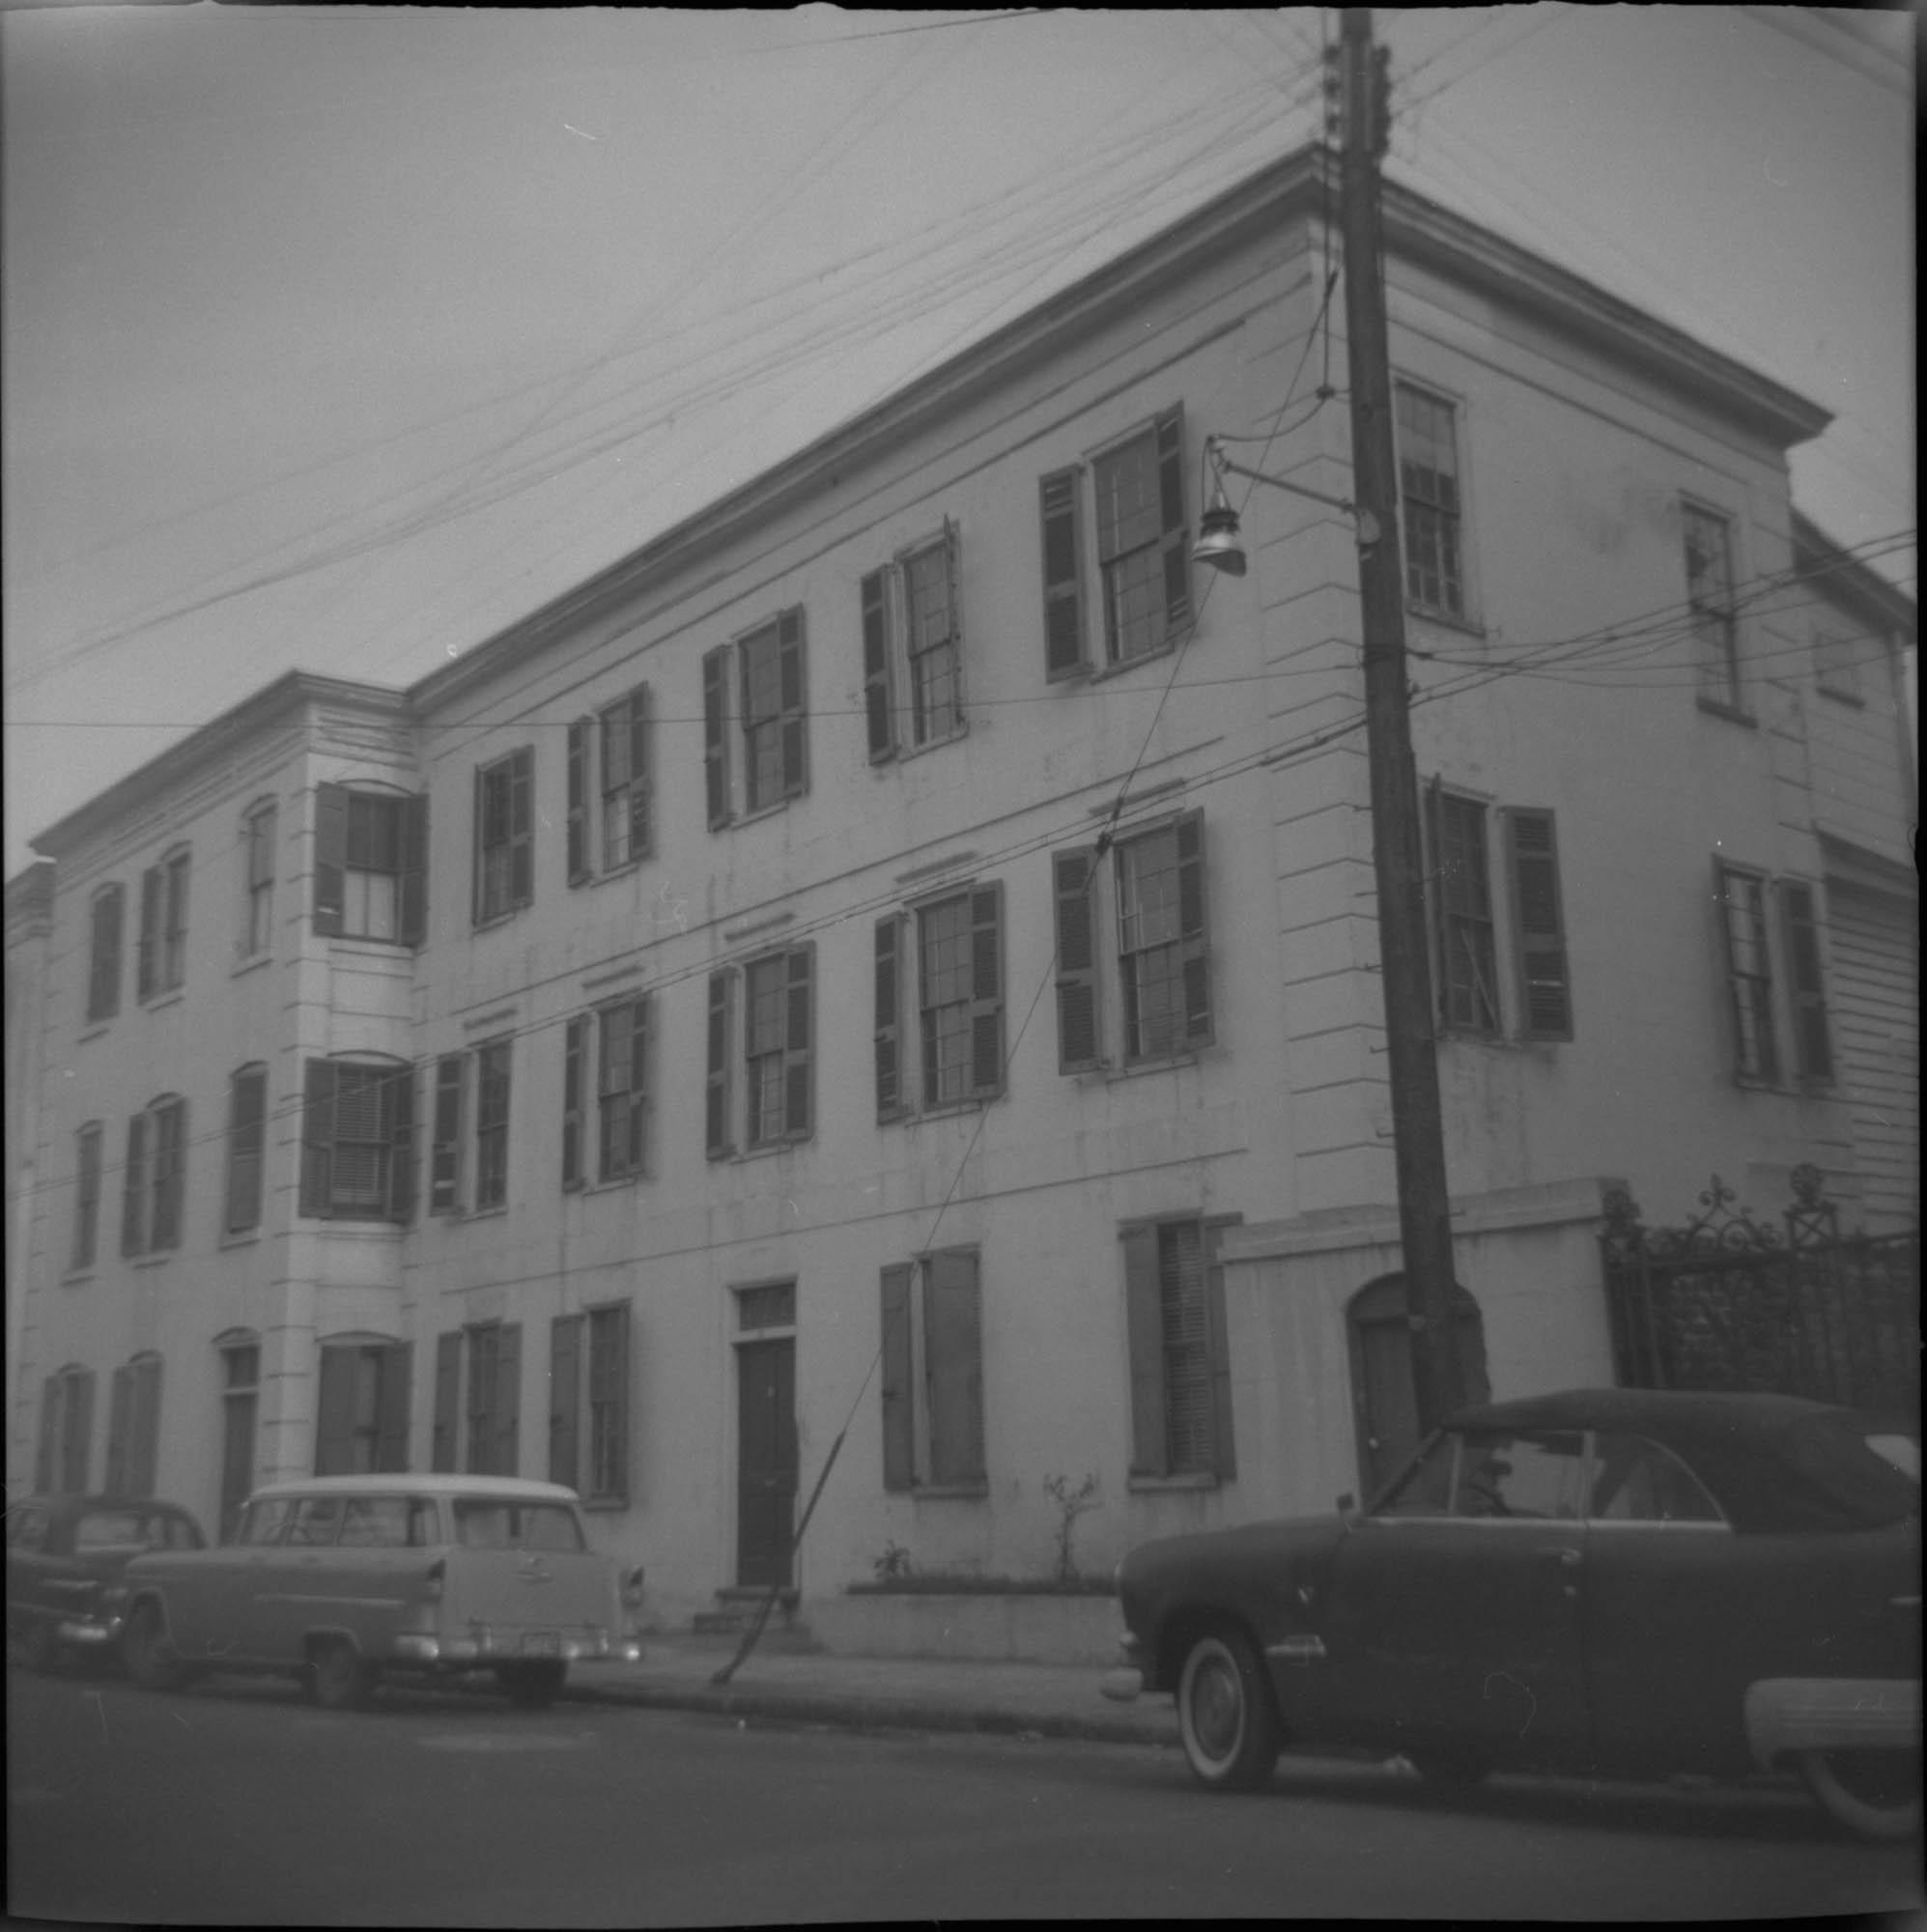 51 Society Street